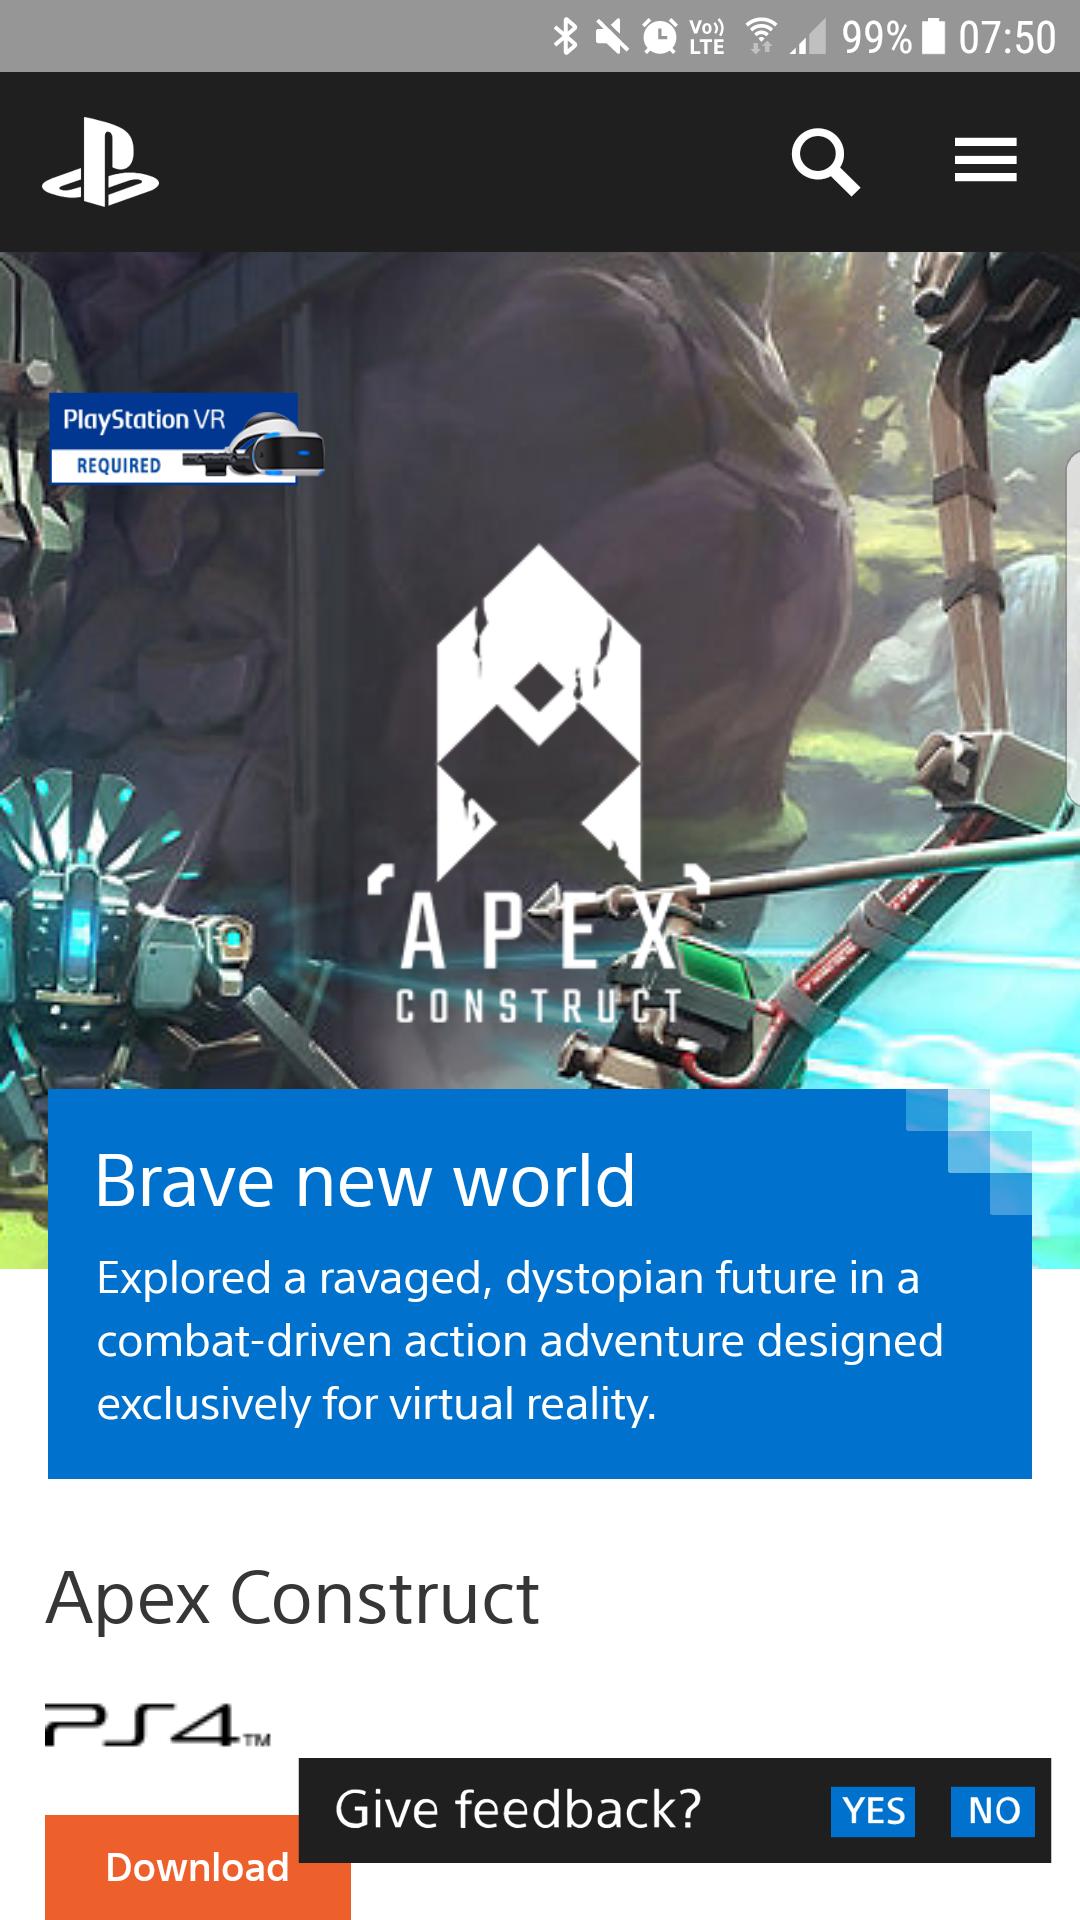 Apex construct Psvr demo free U.S store